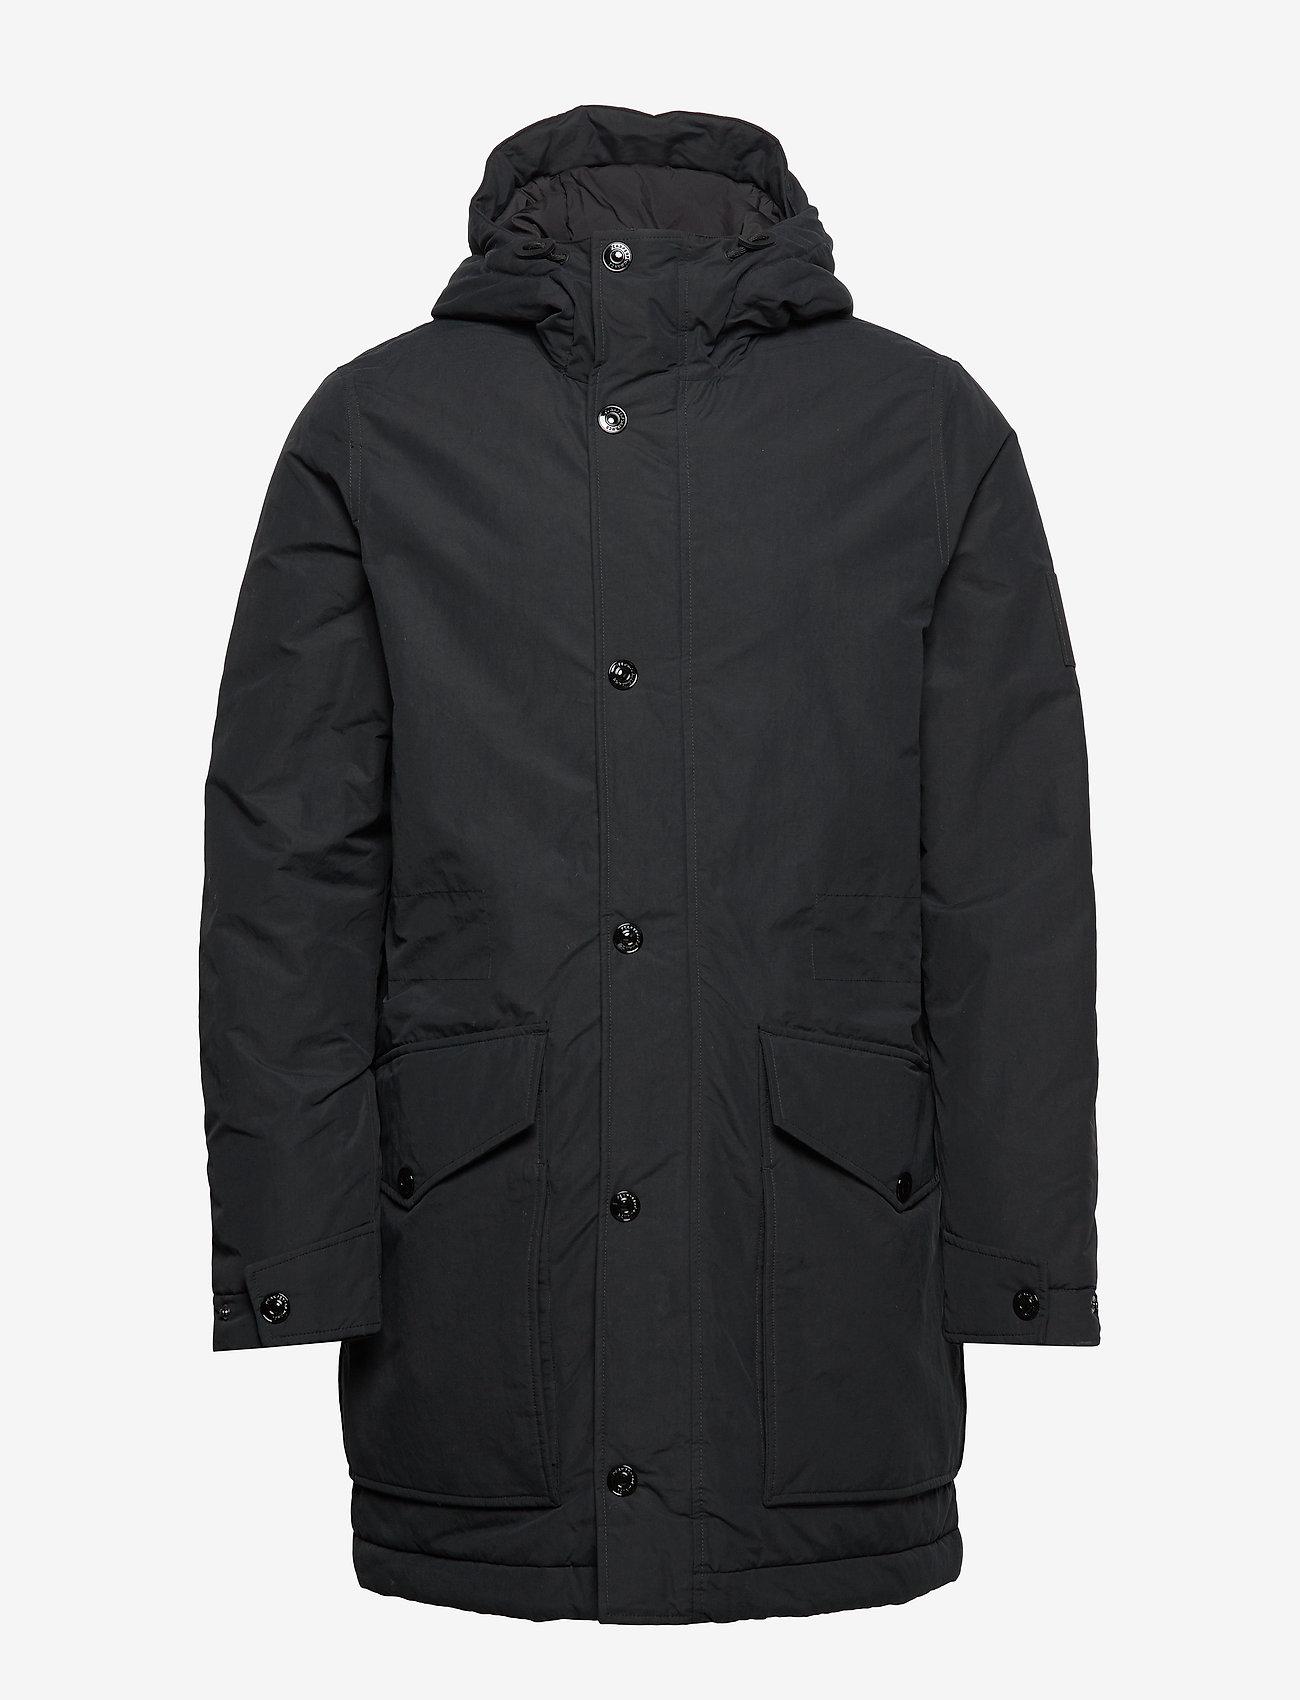 Peak Performance - TYPHON J - insulated jackets - black - 1